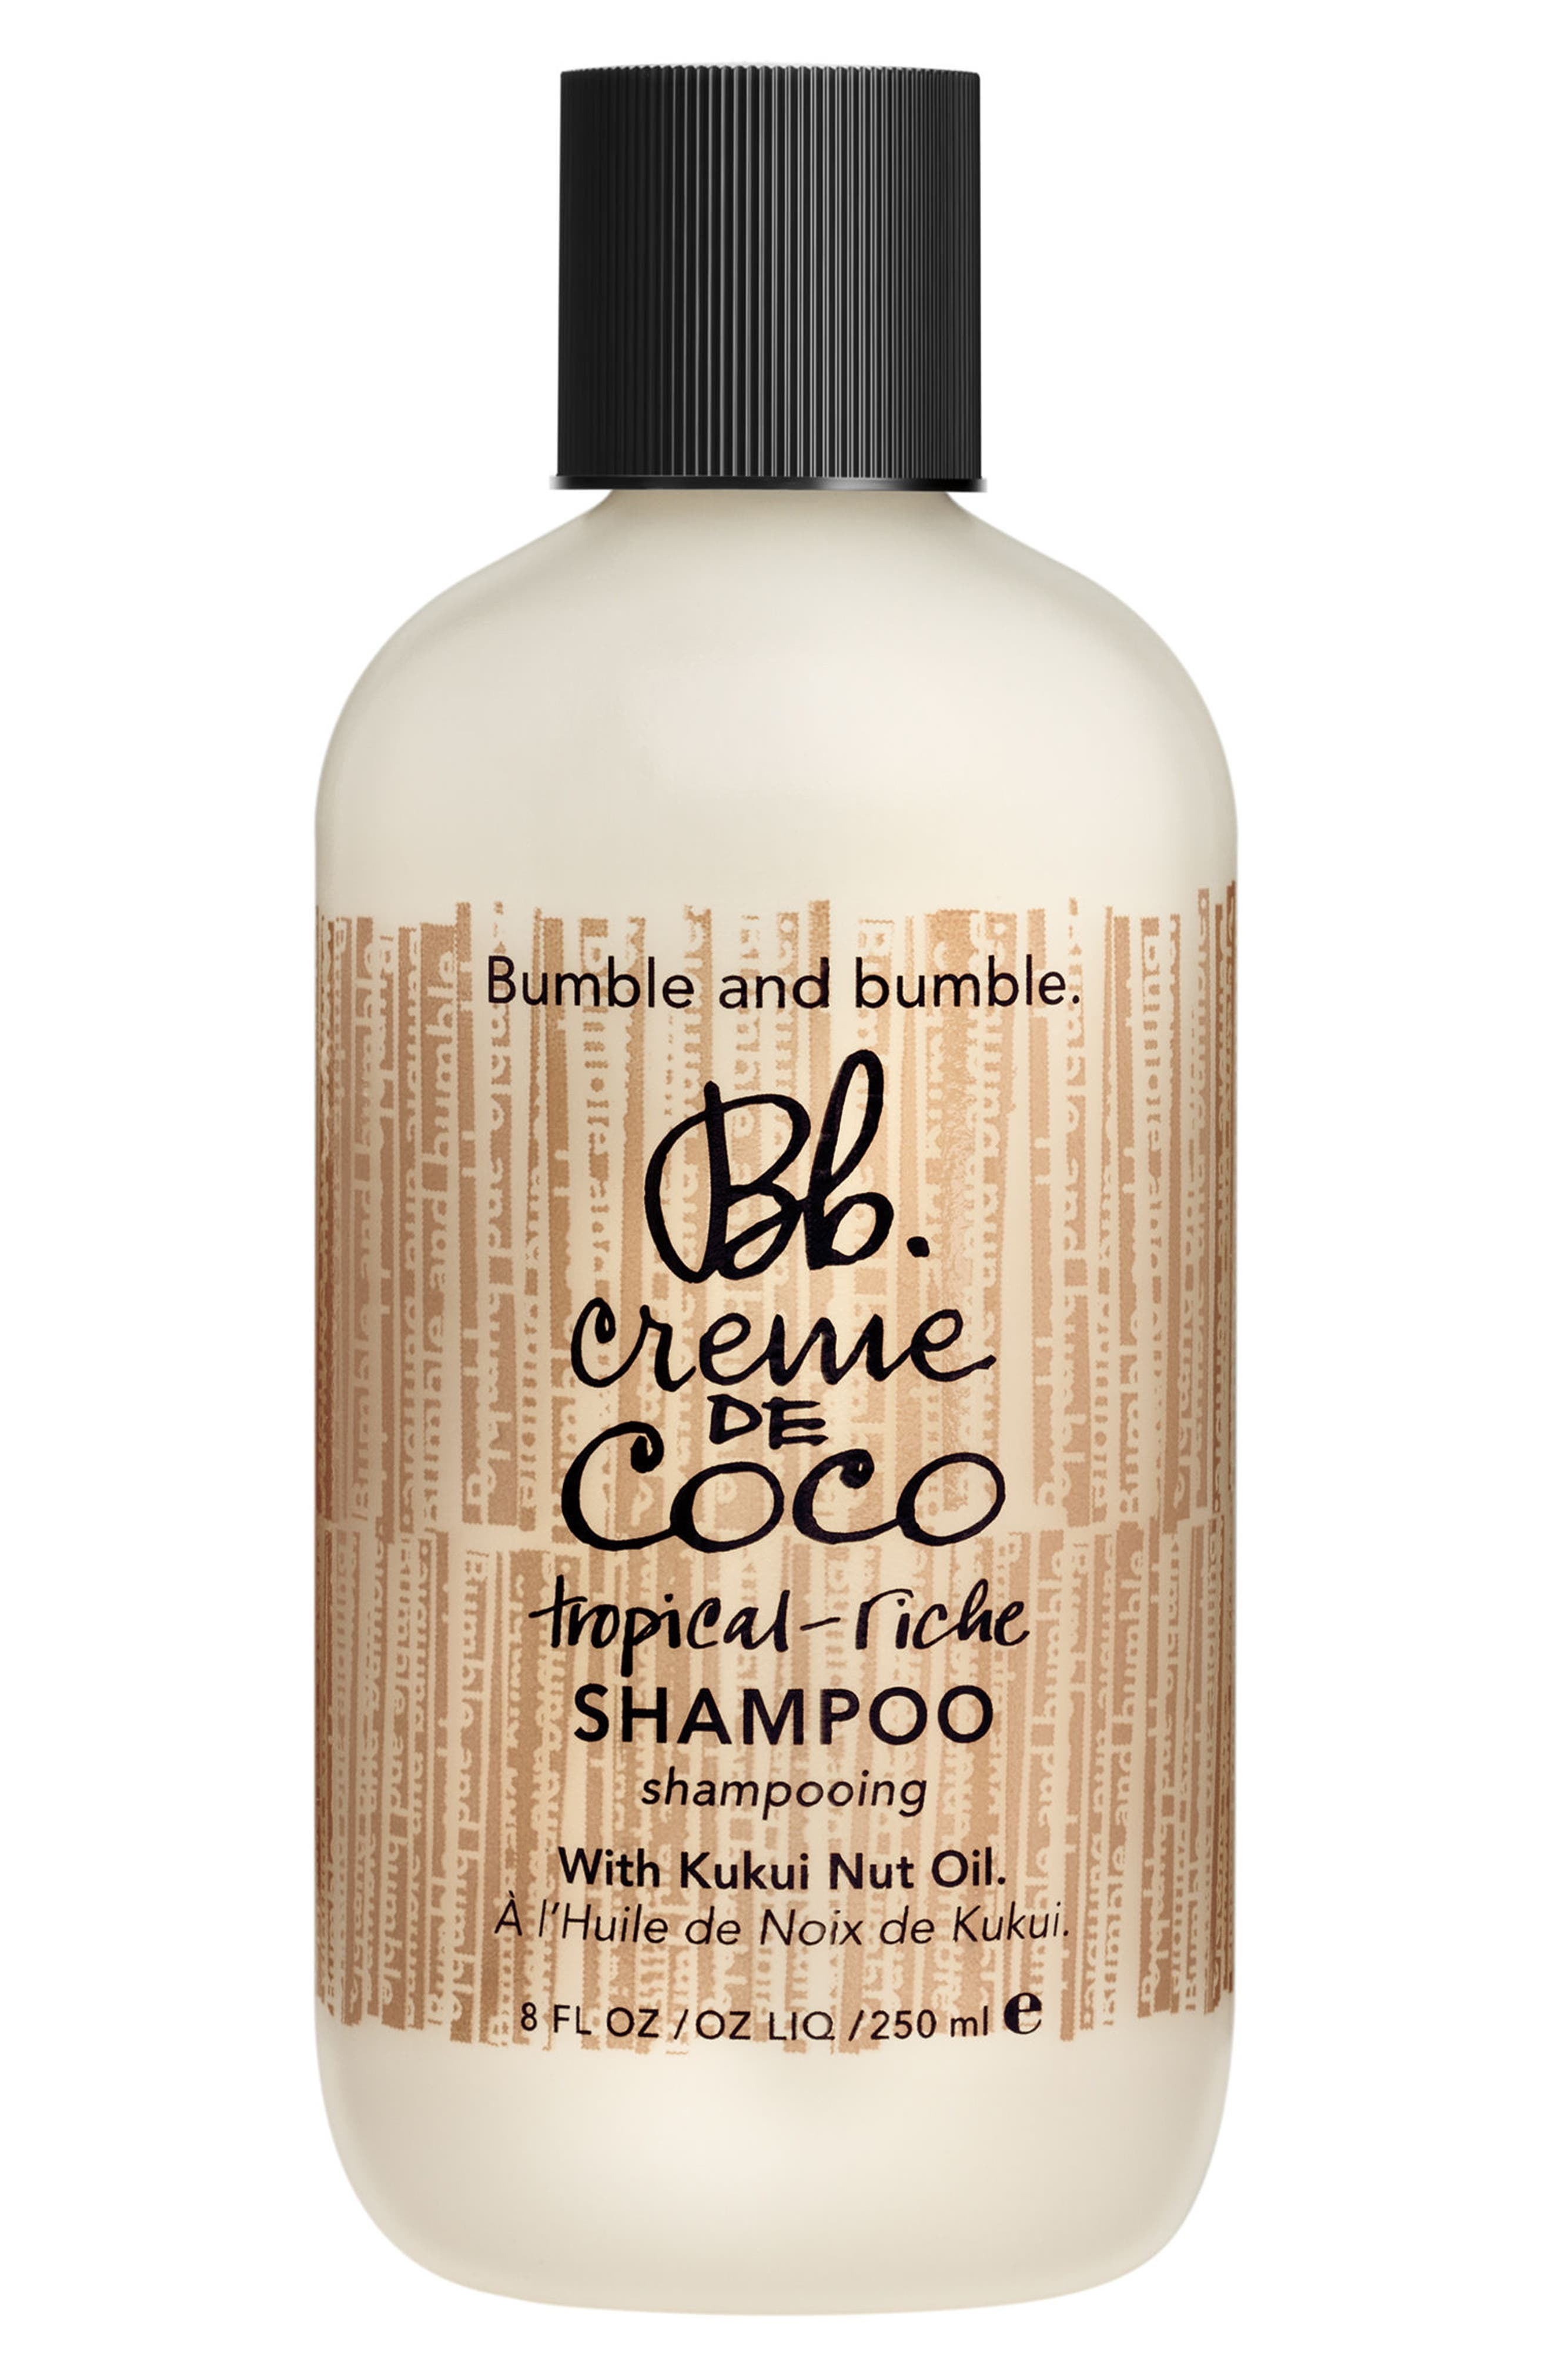 BUMBLE AND BUMBLE., Bumble and bumble Creme de Coco Shampoo, Main thumbnail 1, color, NO COLOR